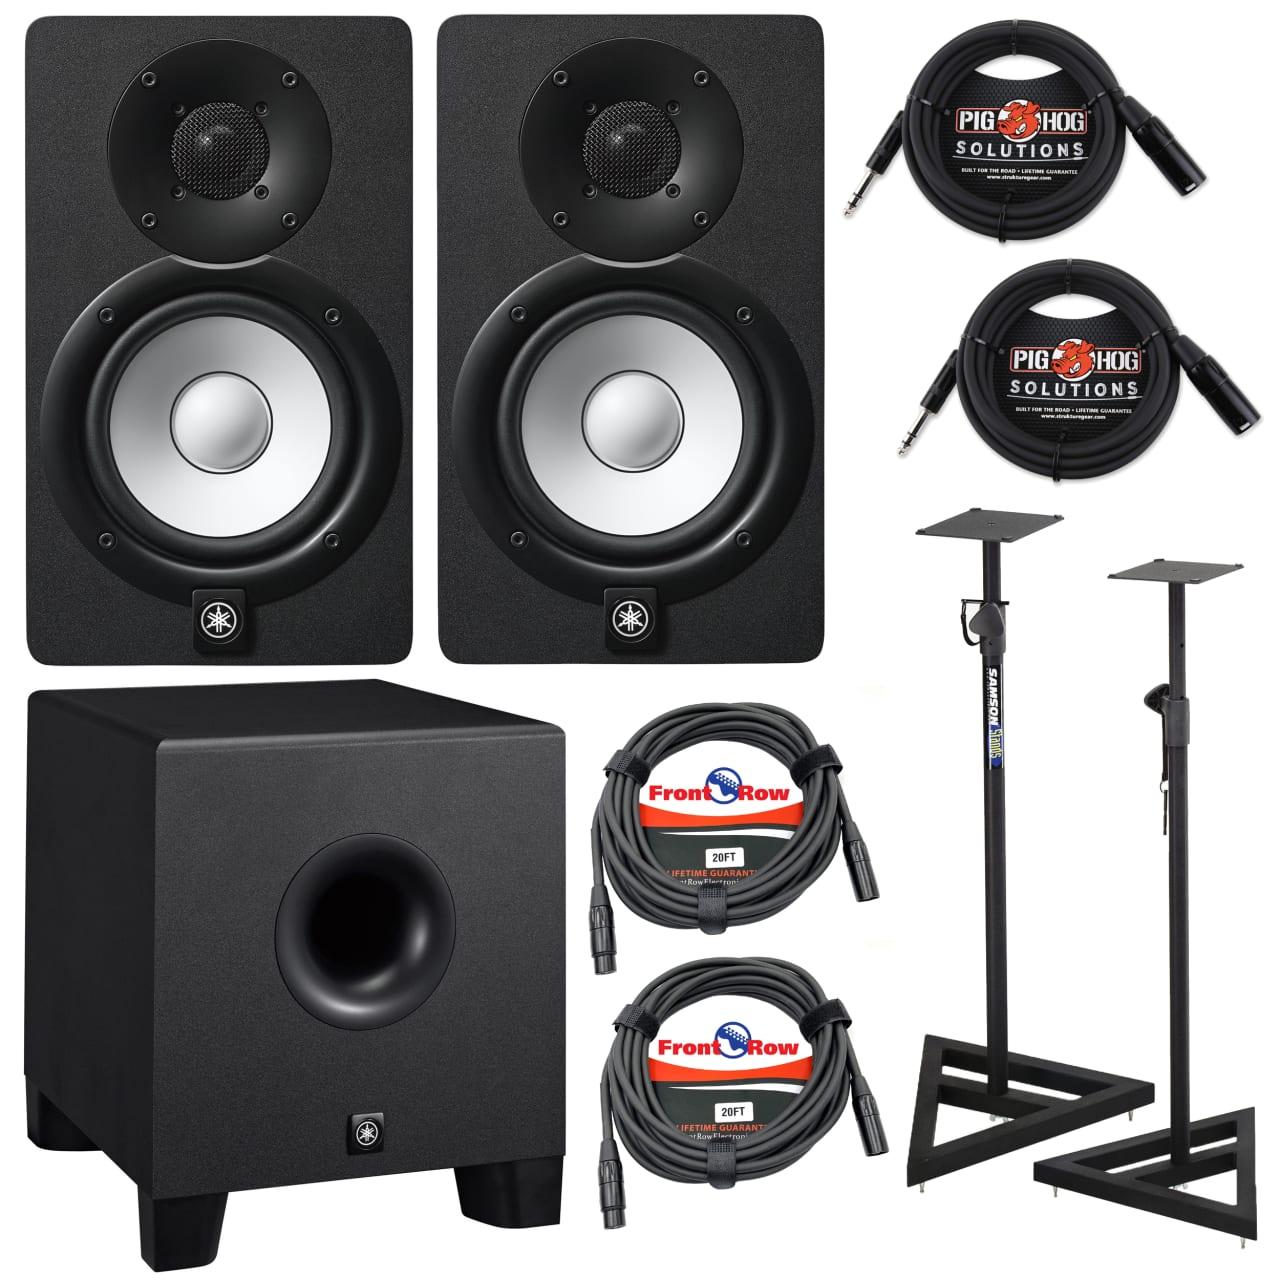 Yamaha Hs Series Hs5 2 Way Studio Monitors Black Pair With Reverb Powered Monitor